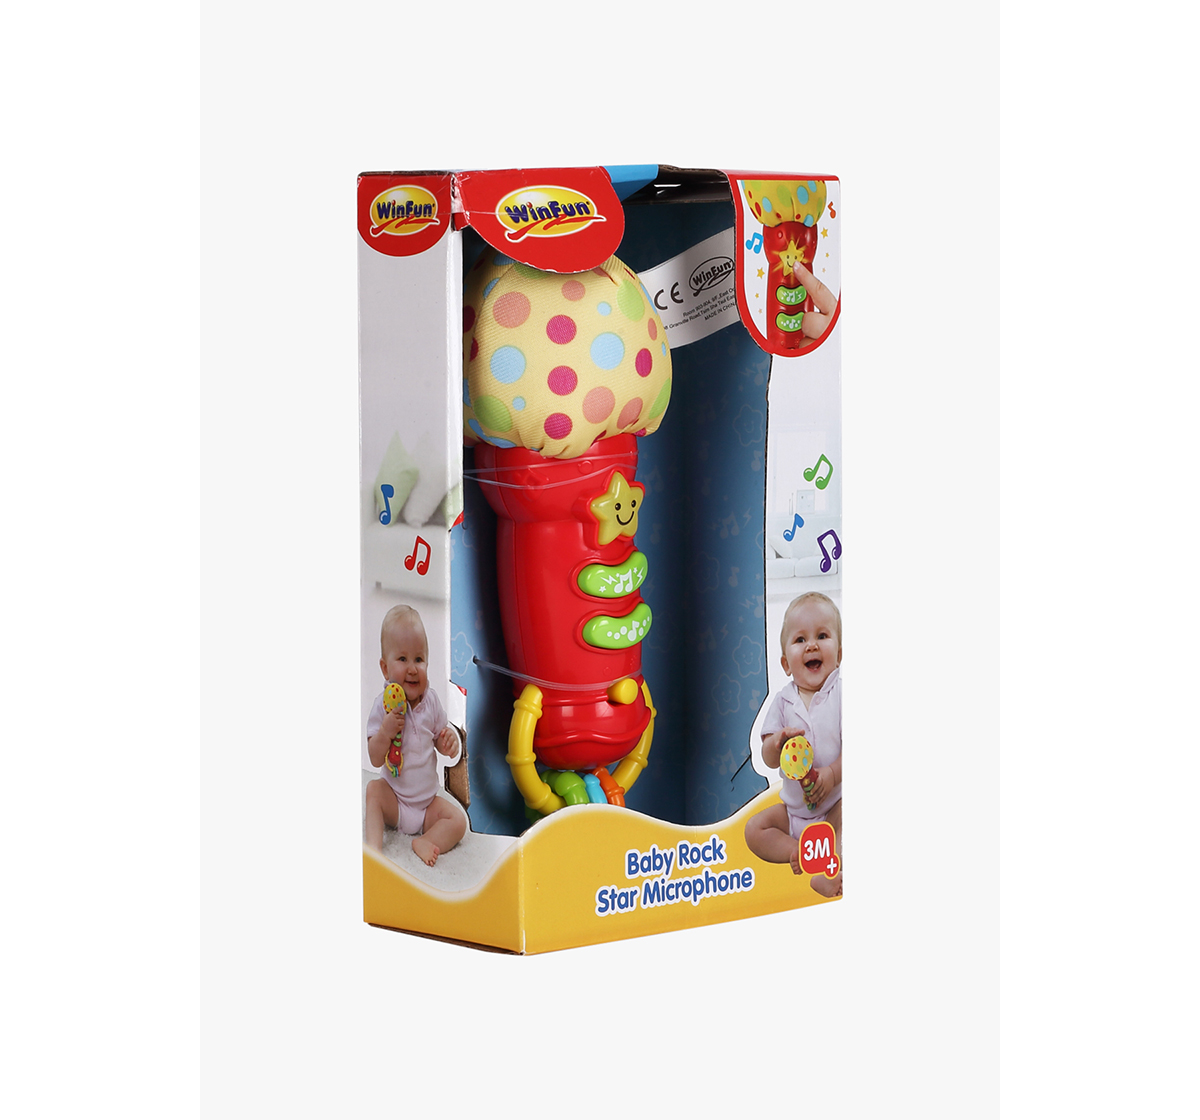 WinFun | Winfun Baby Rock Star Microphone - Mics for Kids age 3M+ (Red)